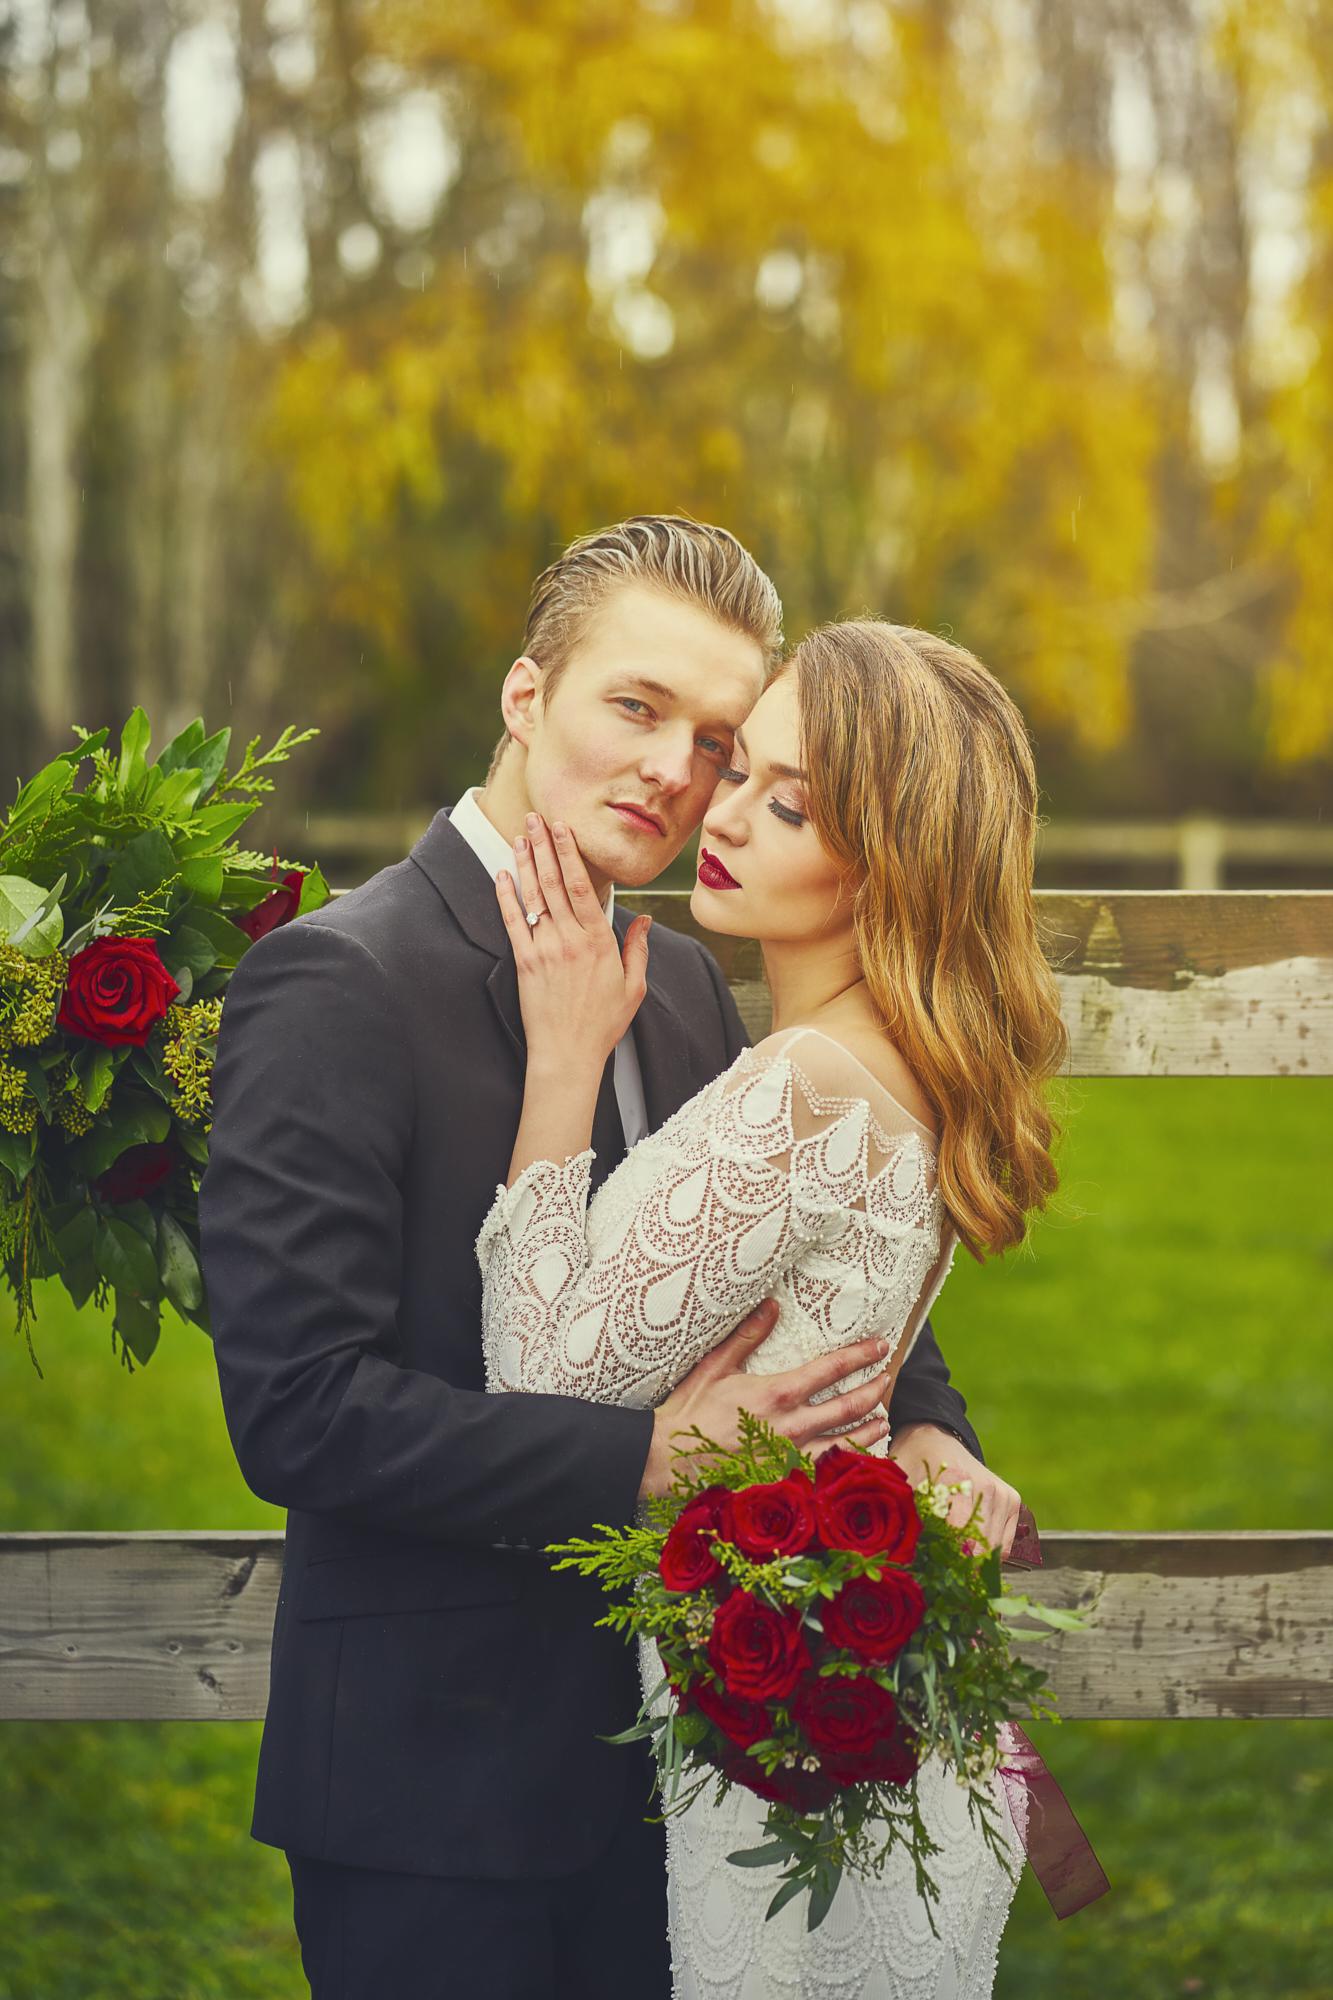 Nov 25 - Bridal Farm Style Shoot - FinalEdit - Web 0023.jpg